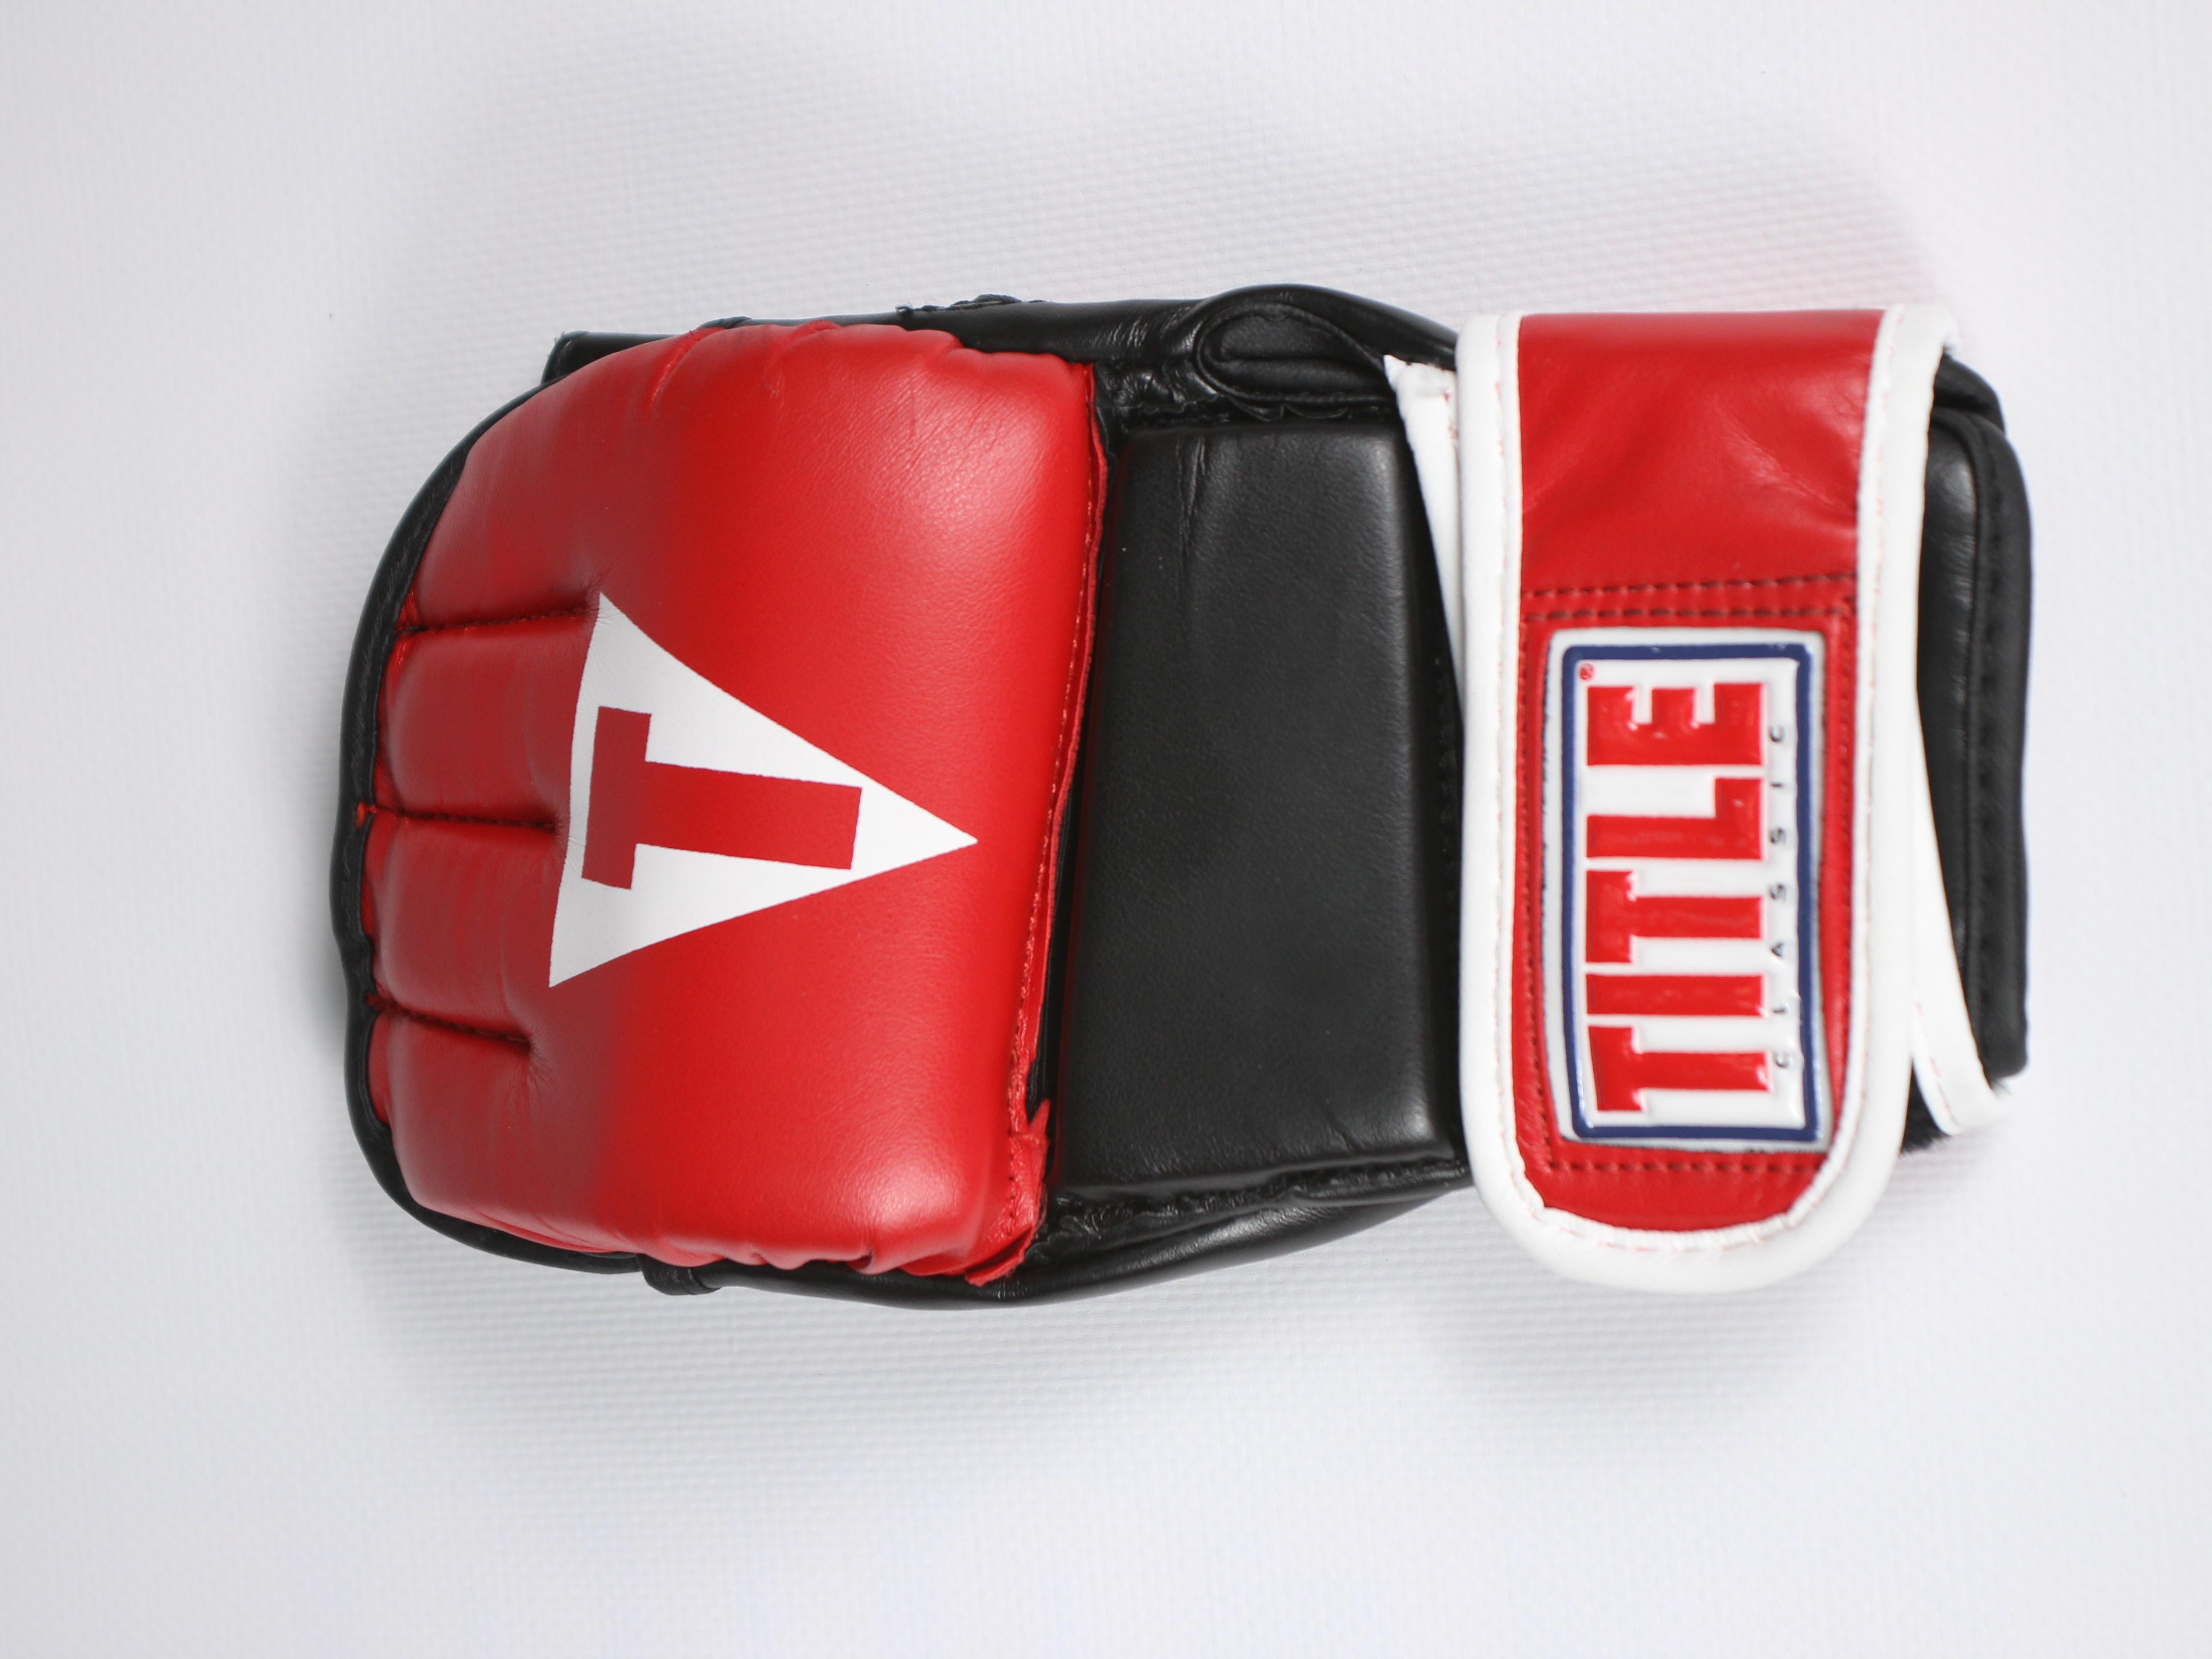 e9c2dfe77e1 ПЕРЧАТКИ MMA TITLE CLASSIC WRISTWRAP HEAVY BAG GLOVES